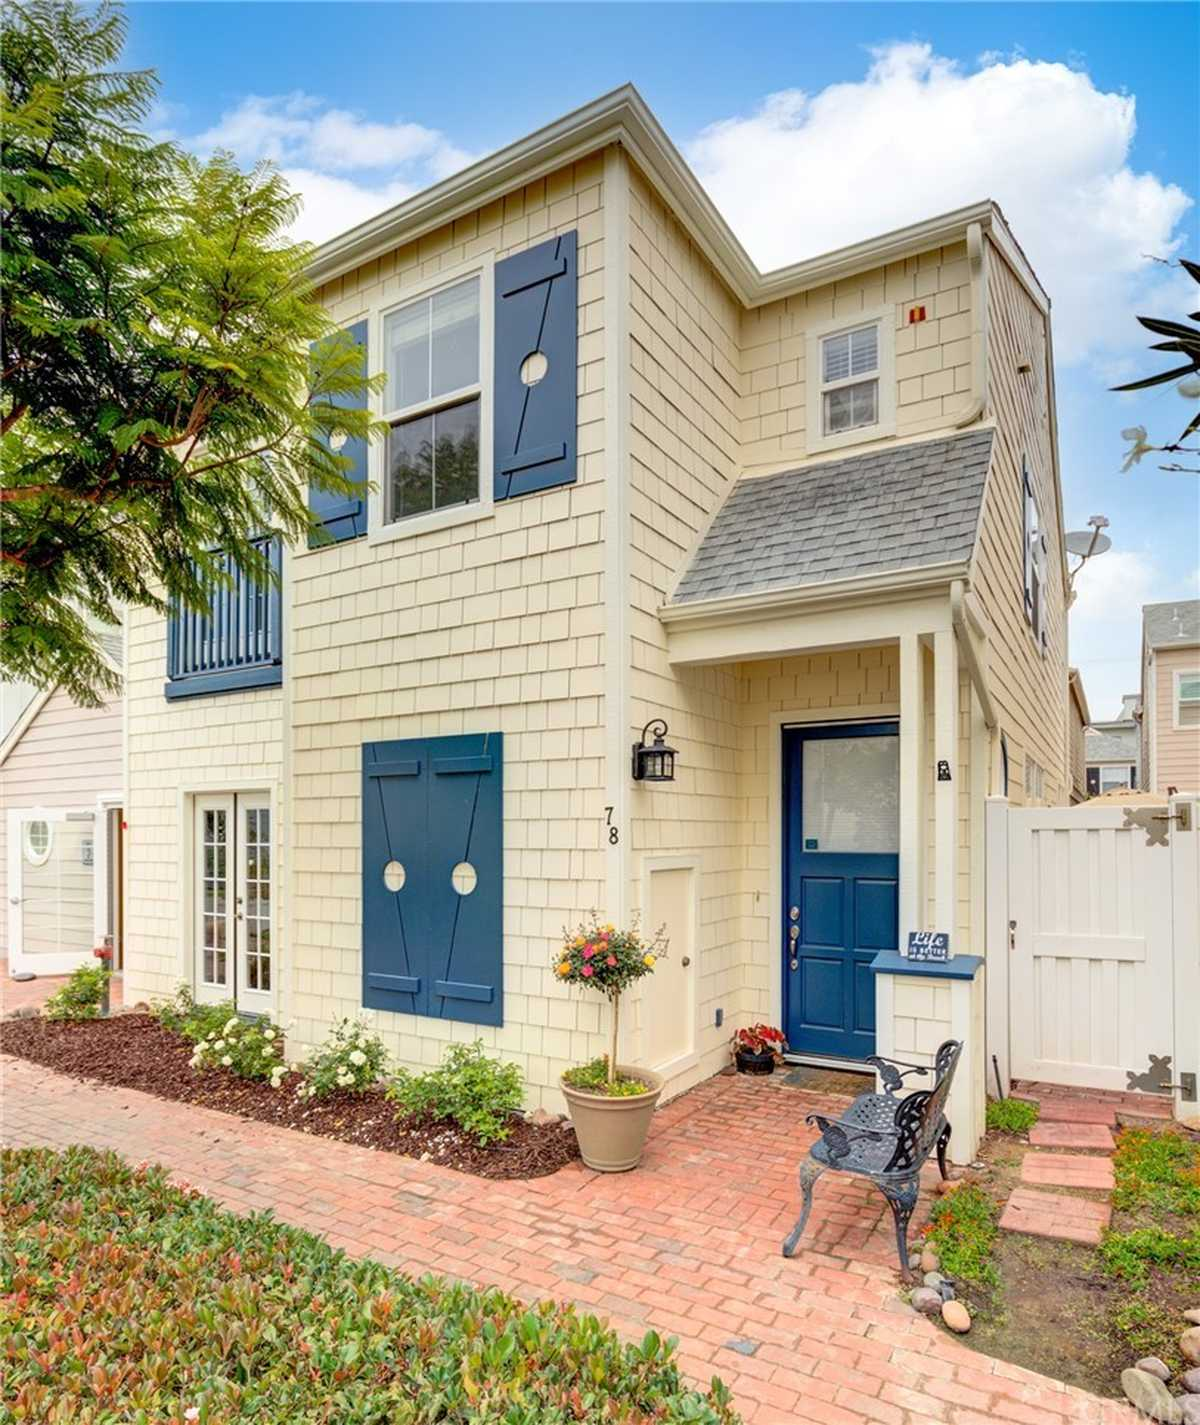 $1,100,000 - 4Br/3Ba -  for Sale in Redondo Beach